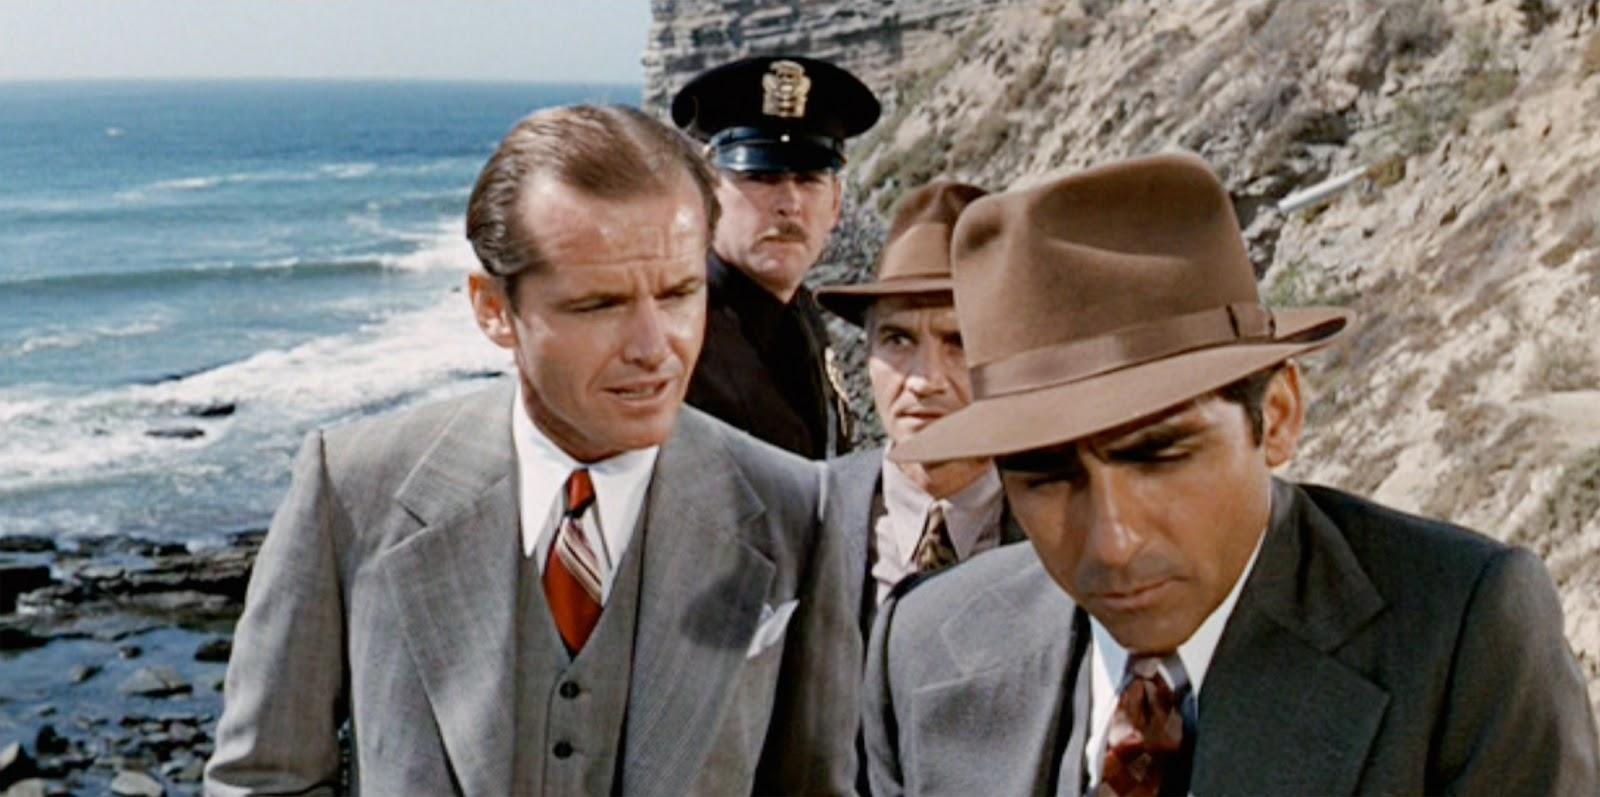 Jack Nicholson Chinatown Suit